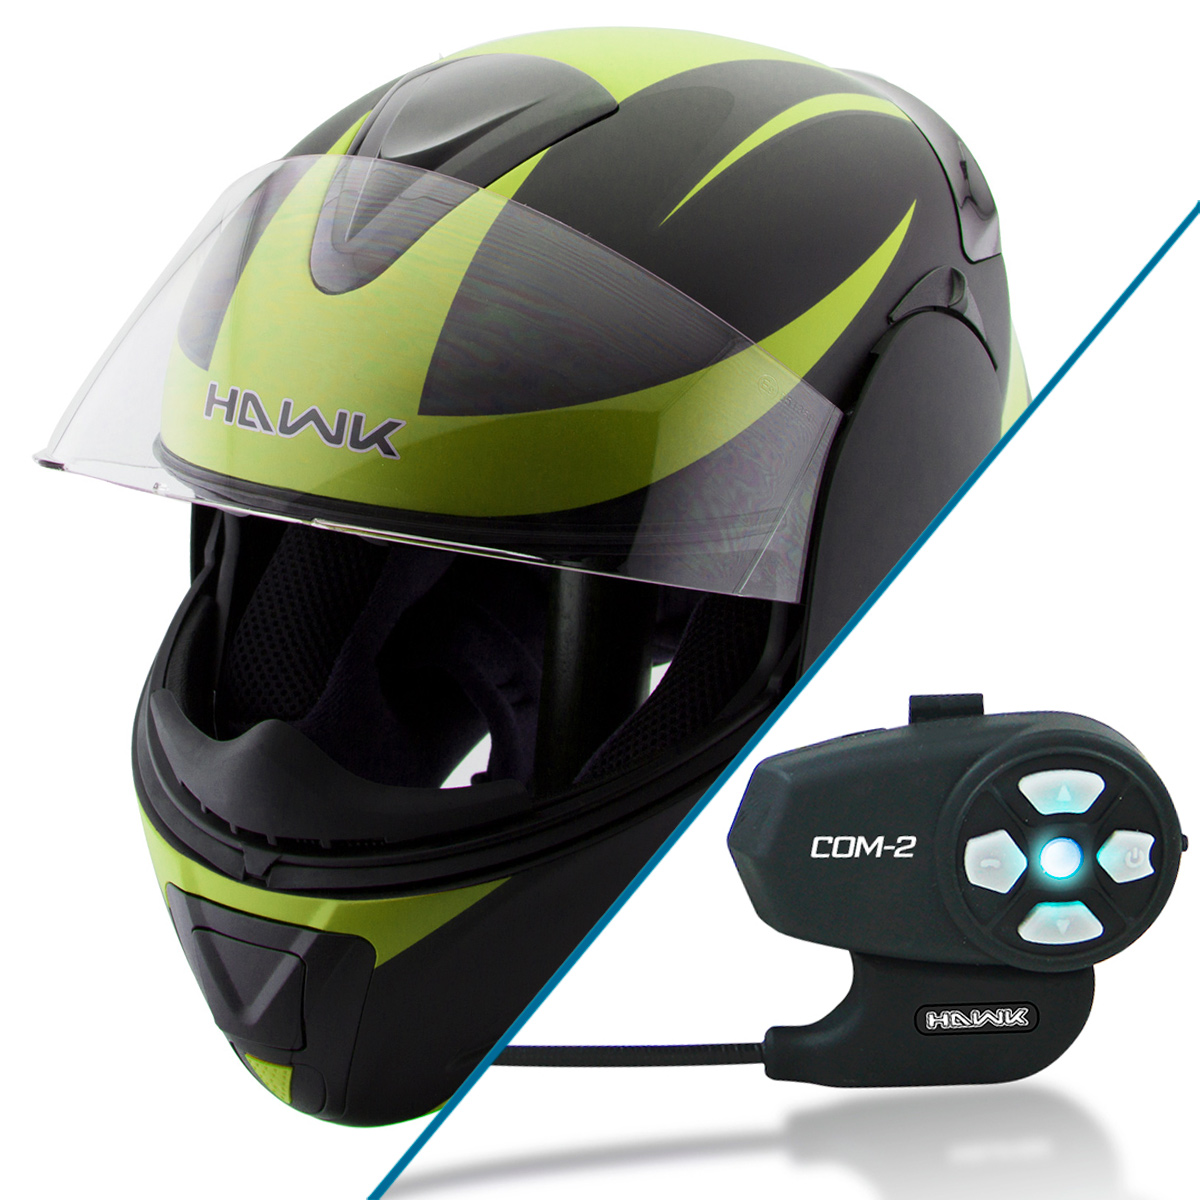 Hawk H-66 Raptor Neon Green Modular Motorcycle Helmet with Hawk COM-2 Bluetooth